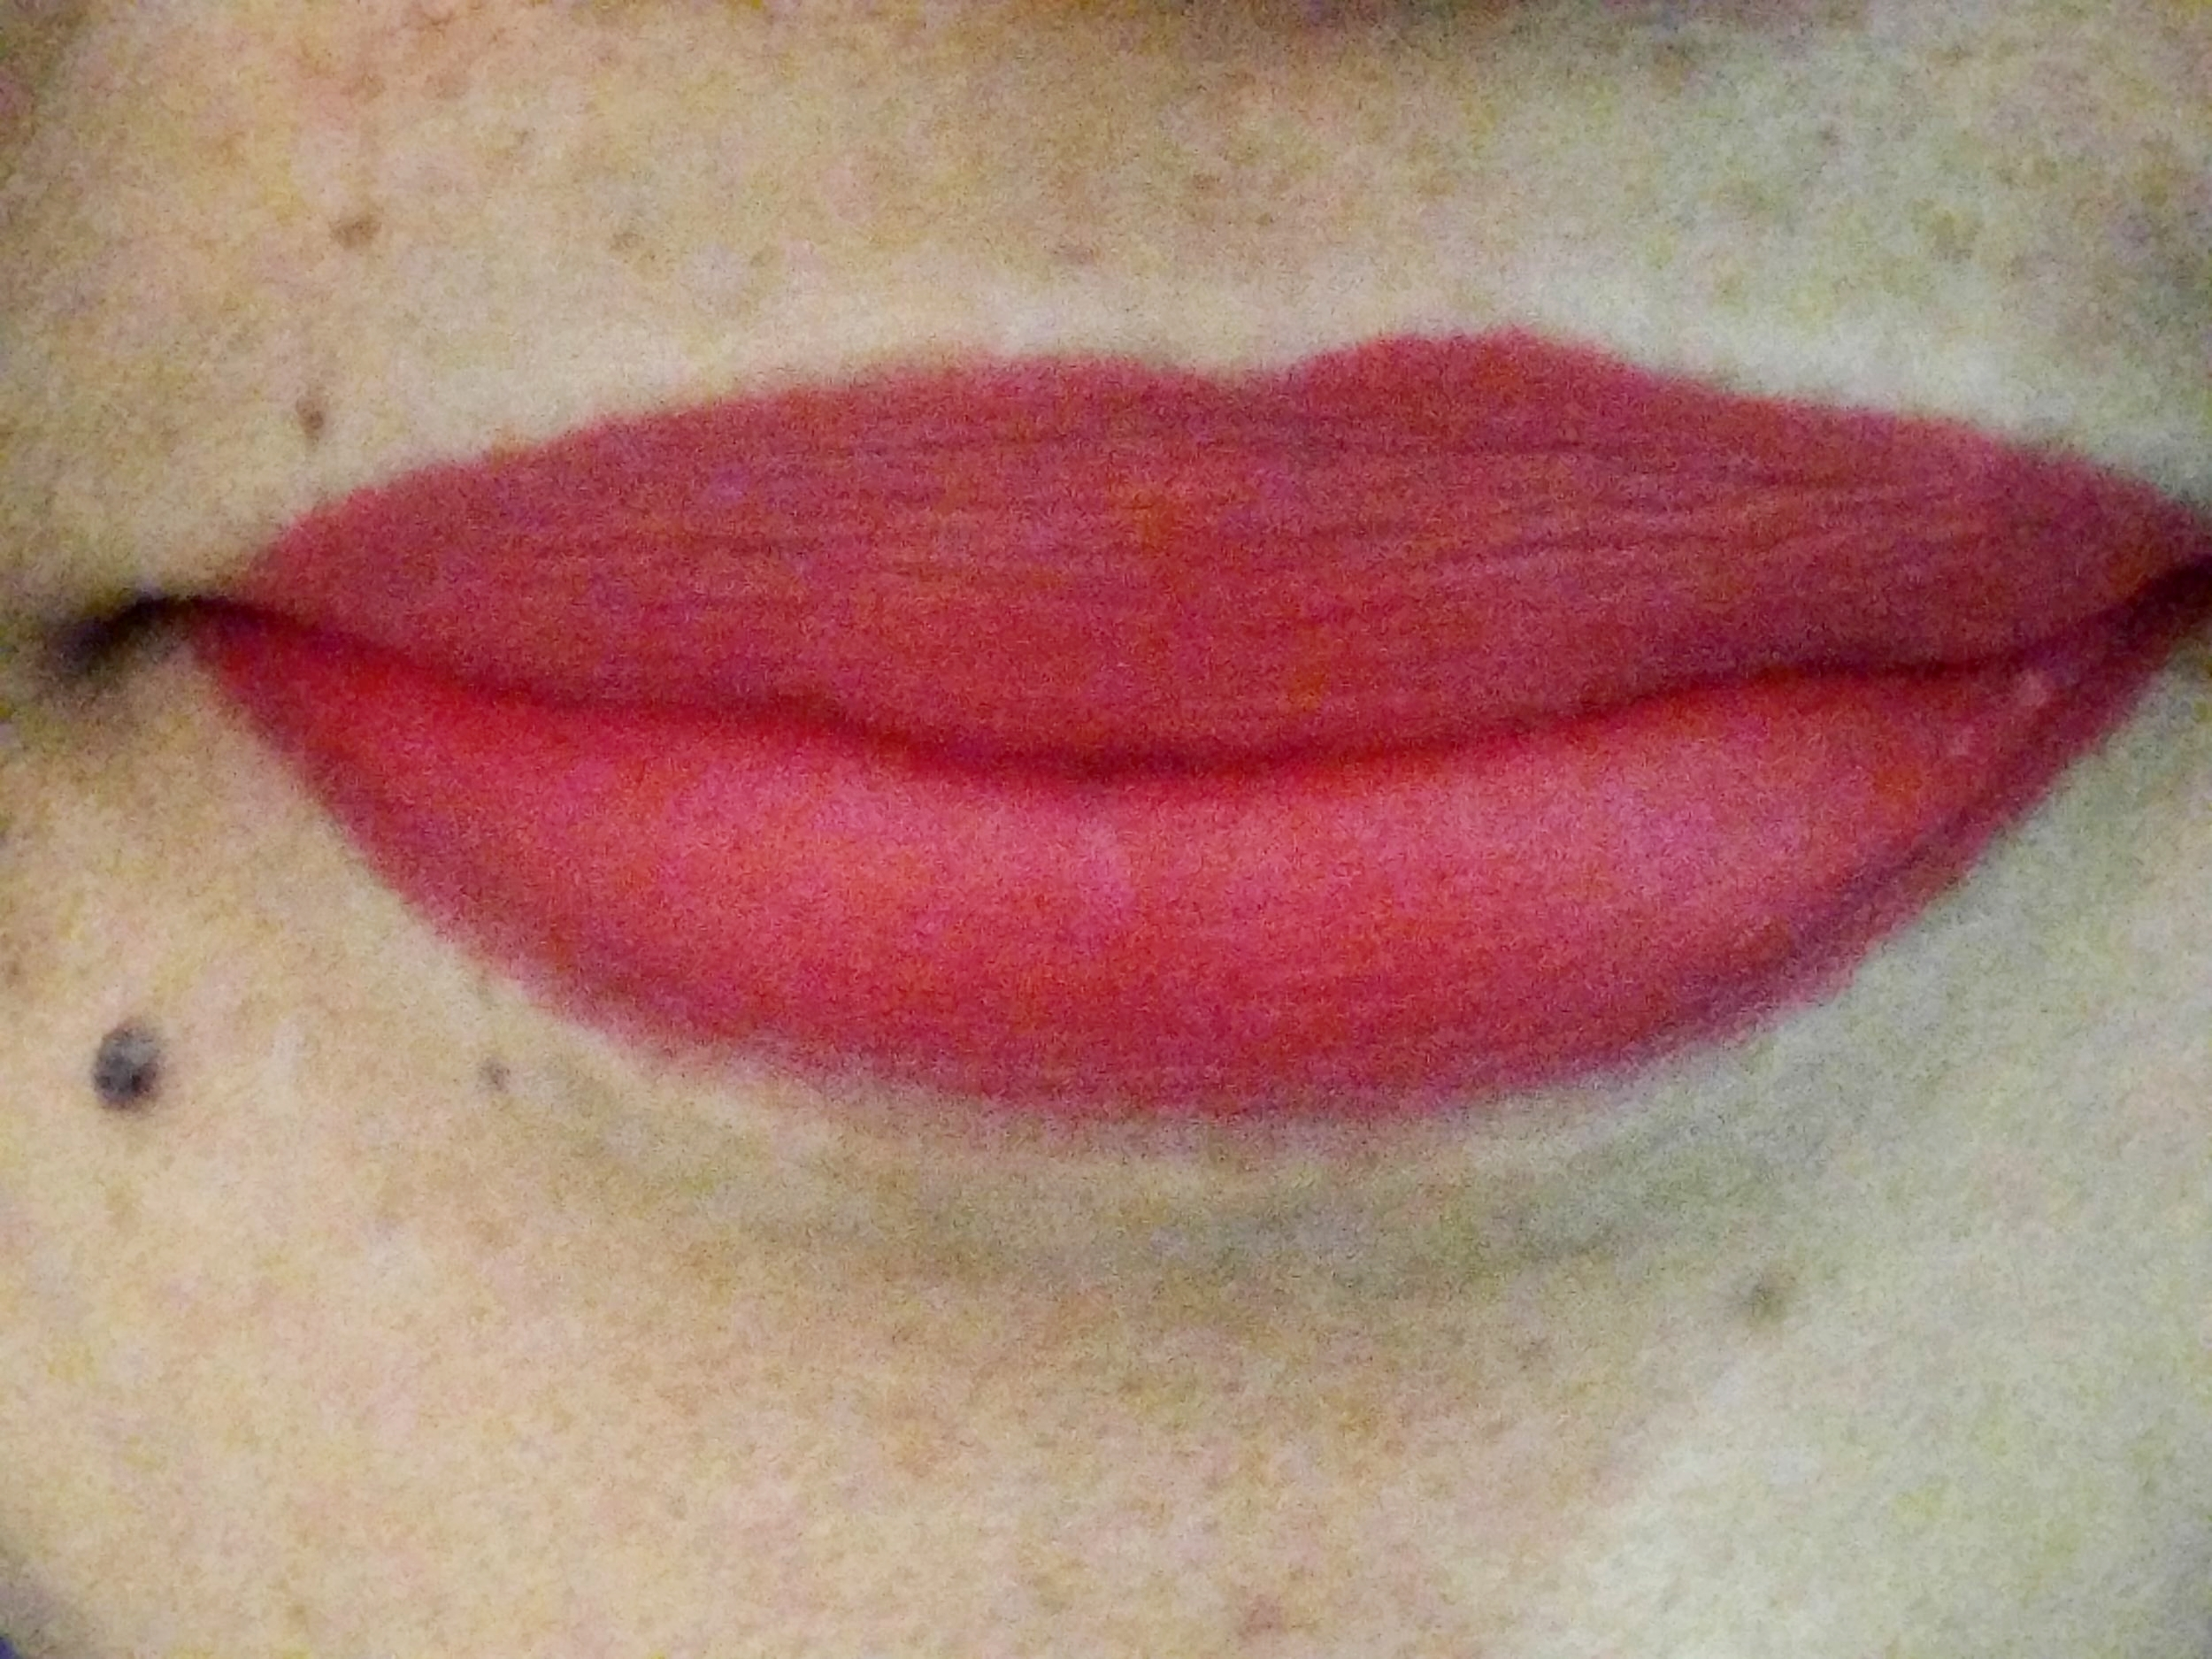 The Happy Skin x Disney Princesses Moisturizing Matte Lippie in Snow White on my lips!